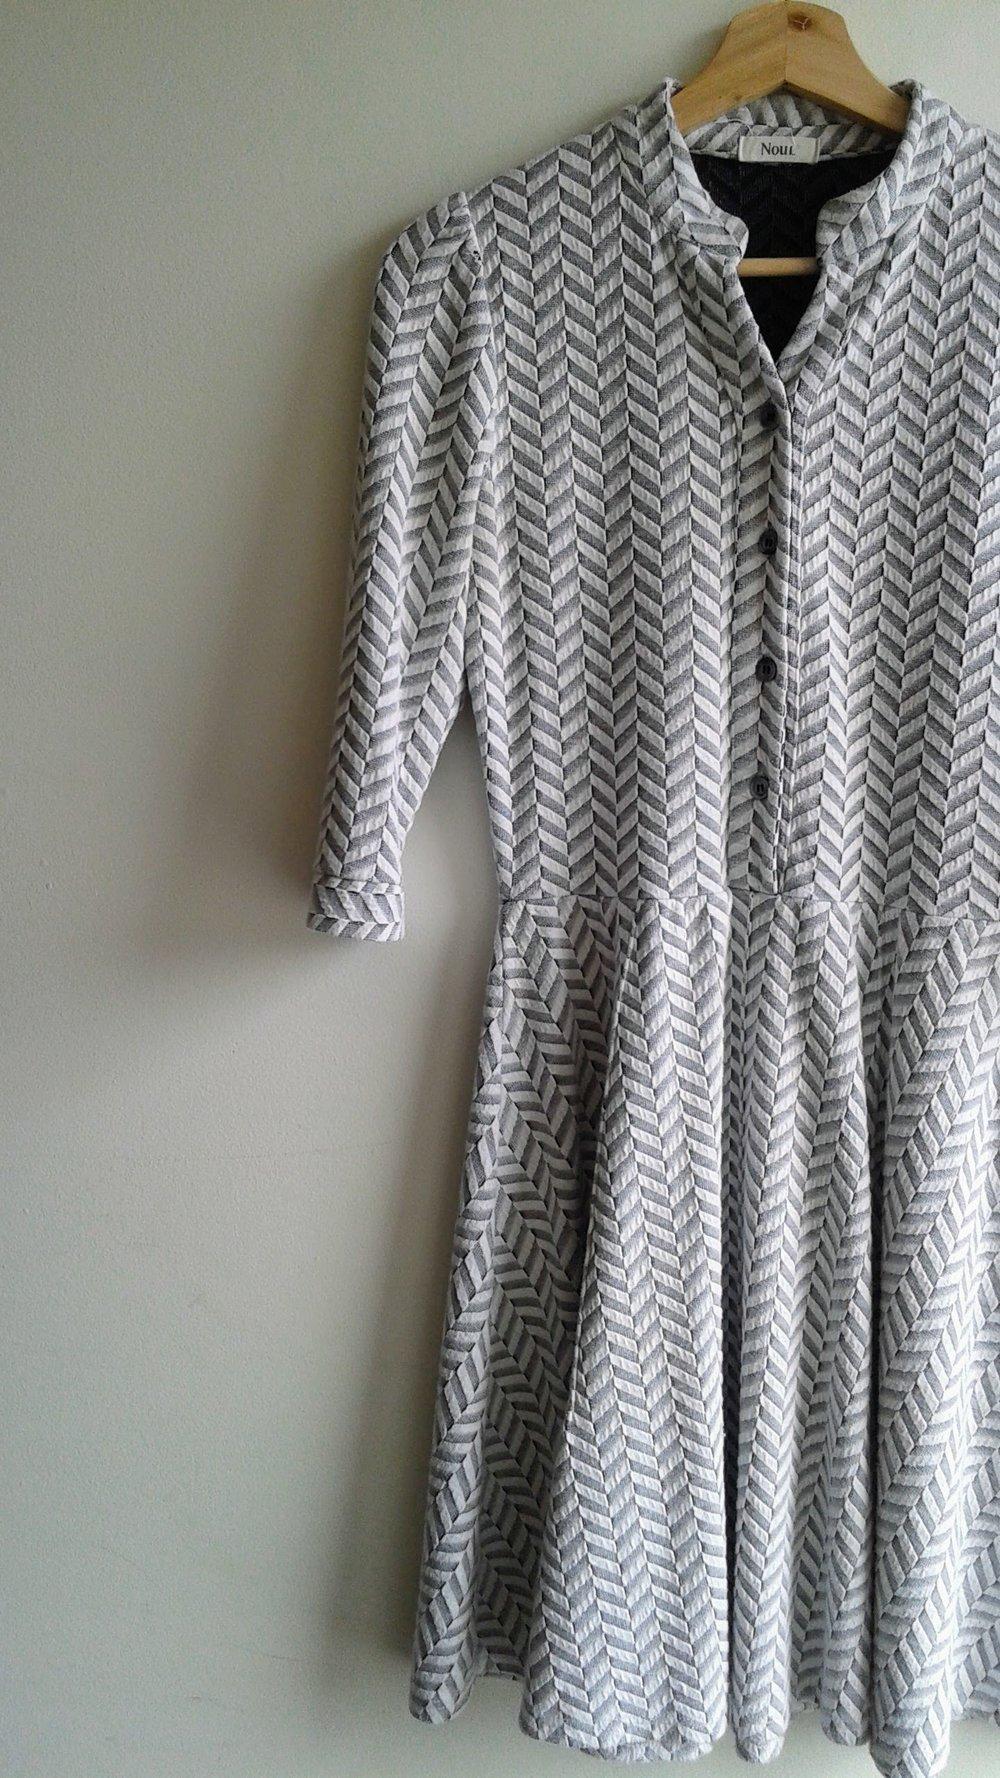 Noul dress; Size M, $46